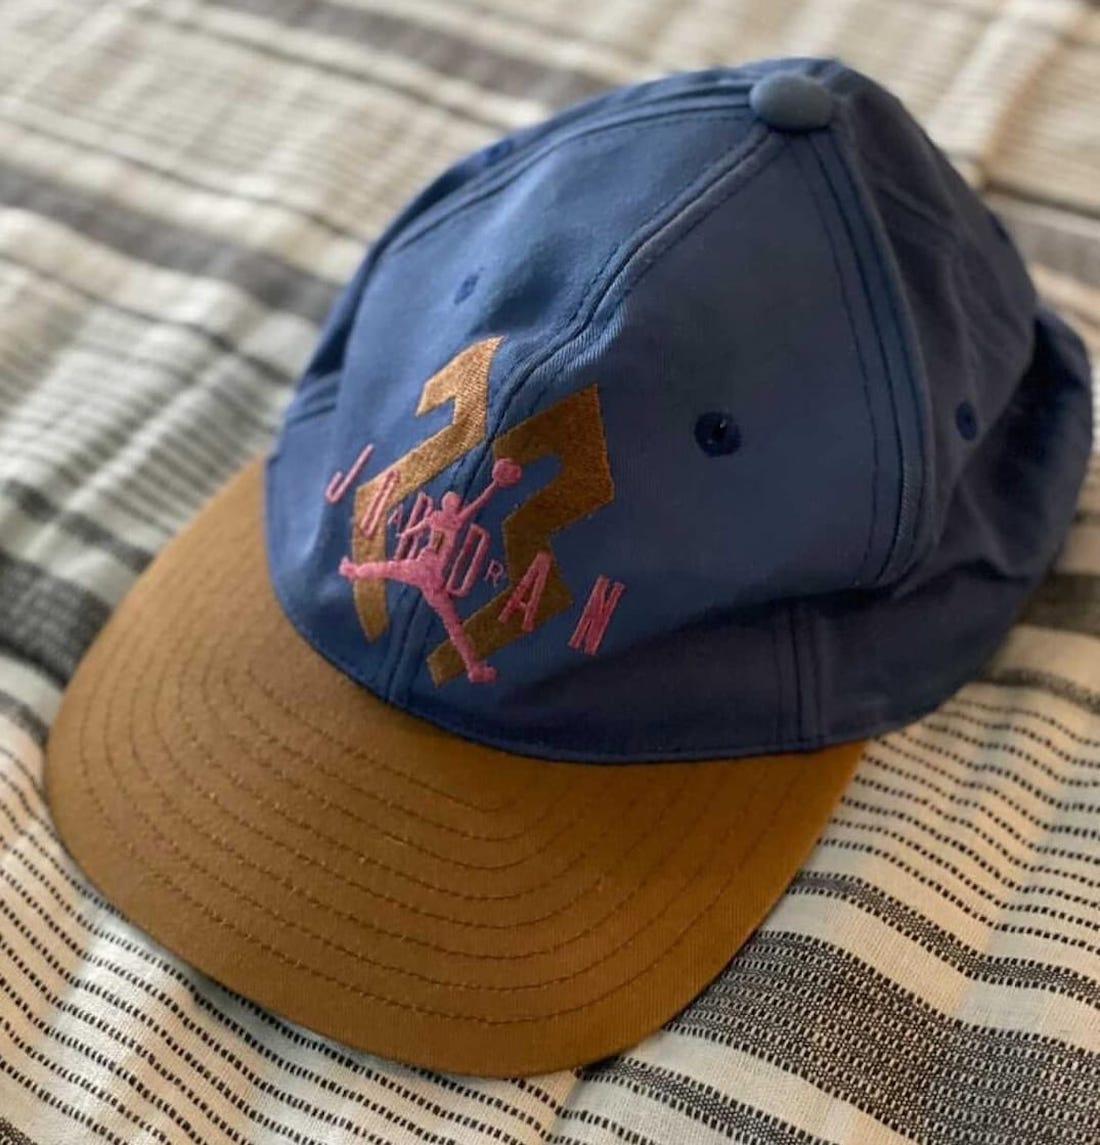 Steve Pelletier Air Jordan Hat